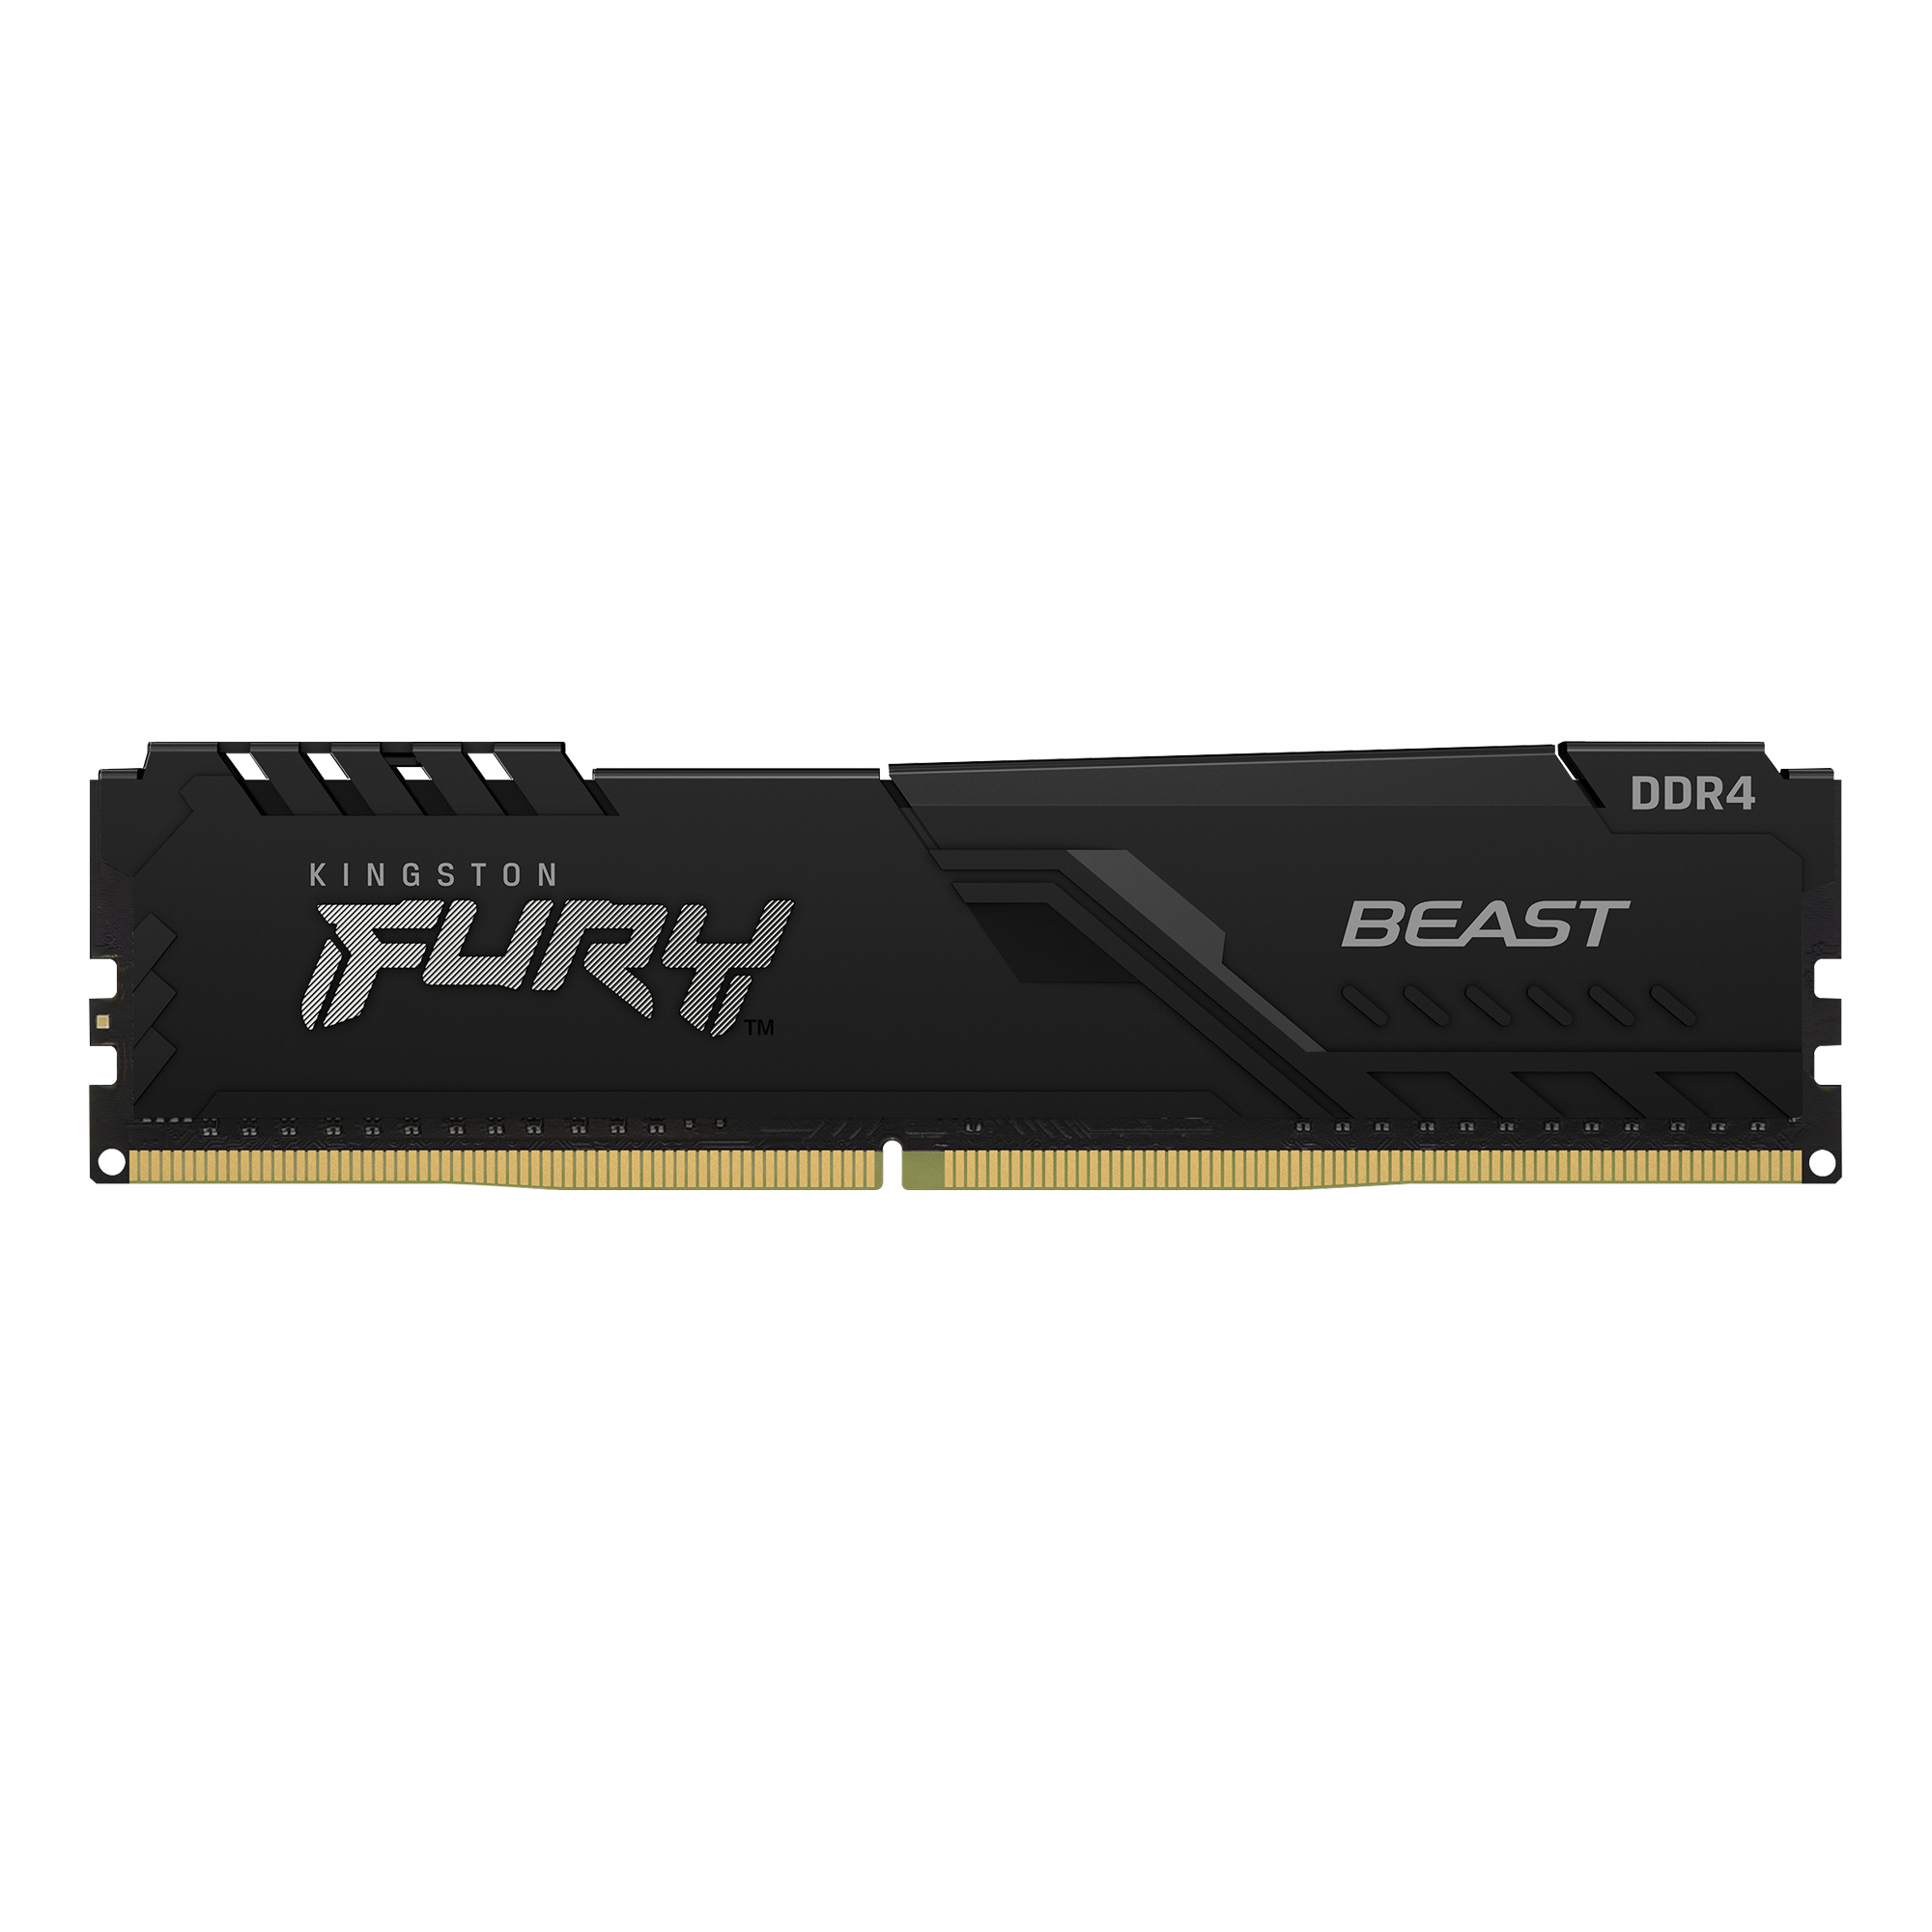 FURY BEAST MóDULO DE MEMORIA 16 GB 1 X 16 GB DDR4 2666 MHZ